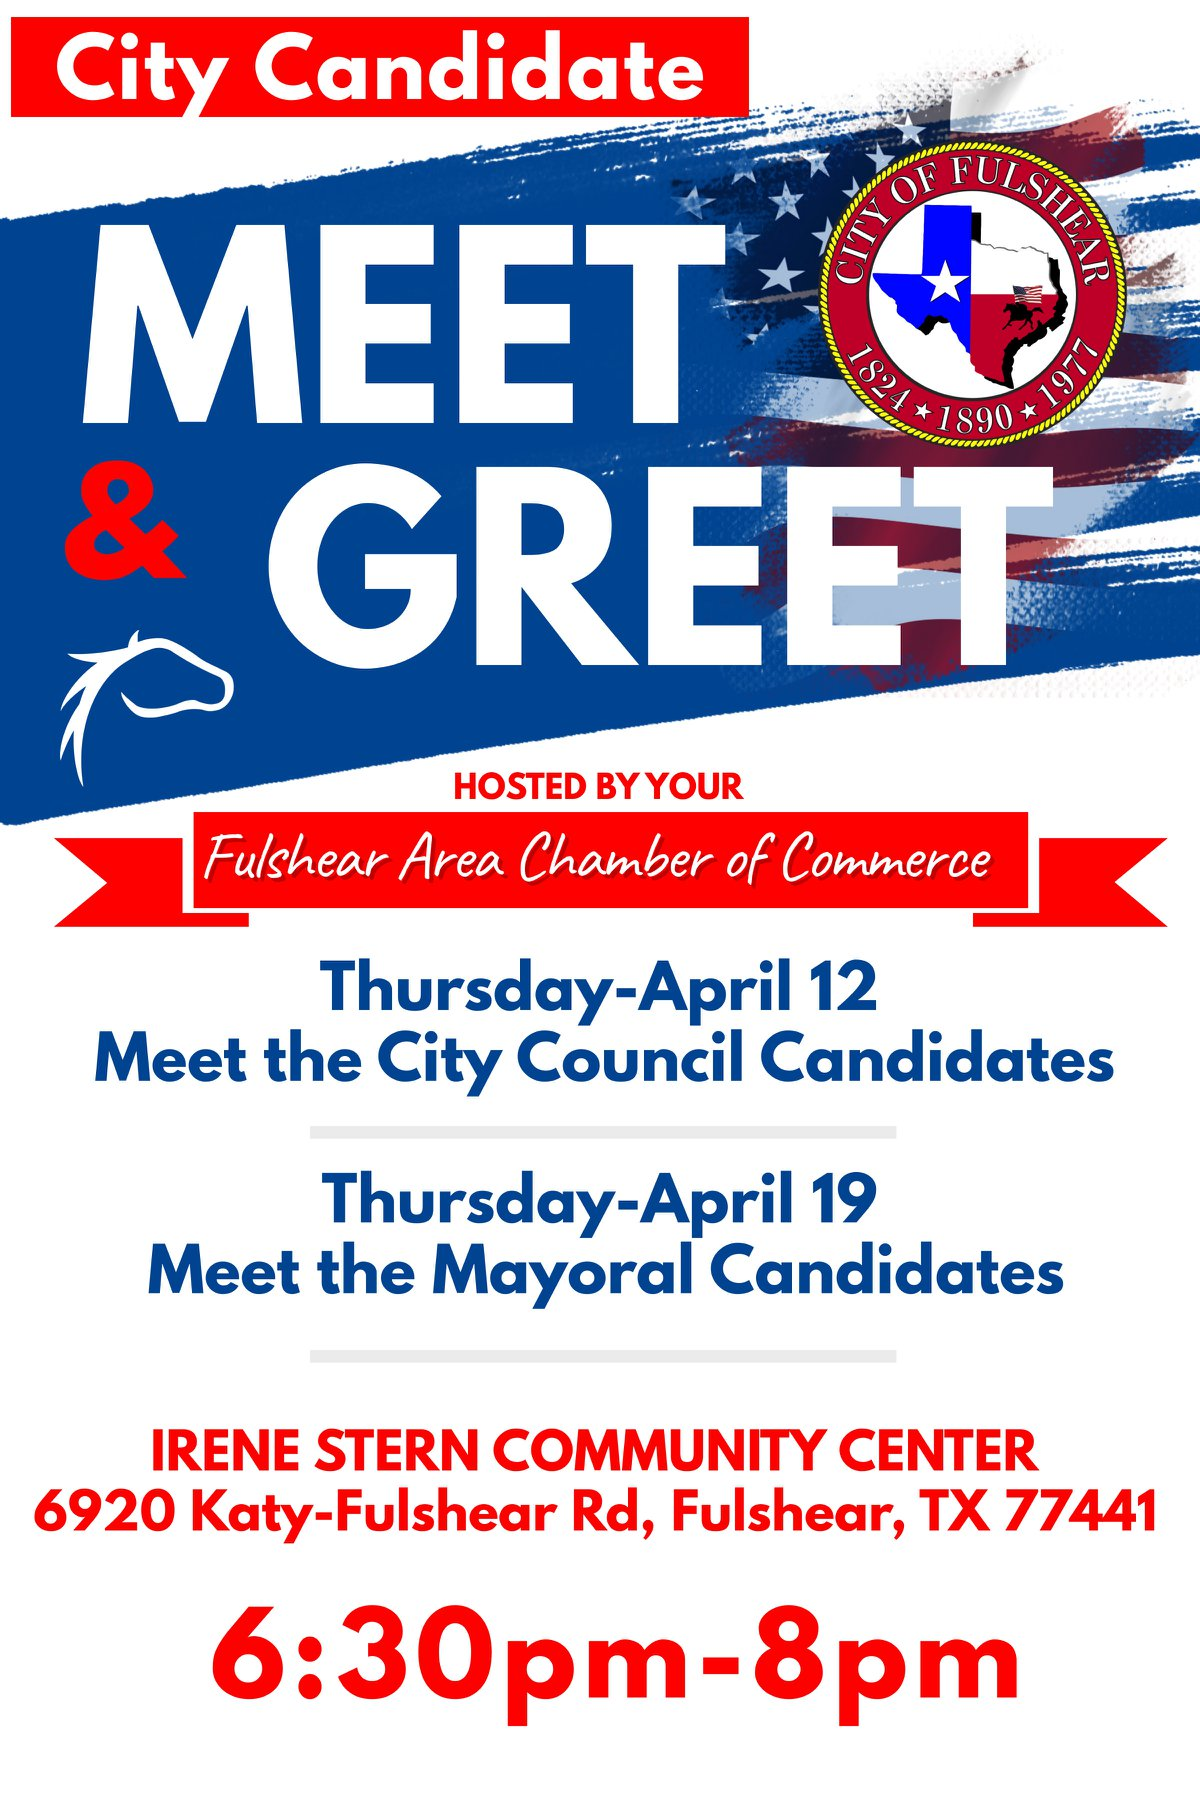 2018-City-Candidate-Meet-and-Greet.jpg